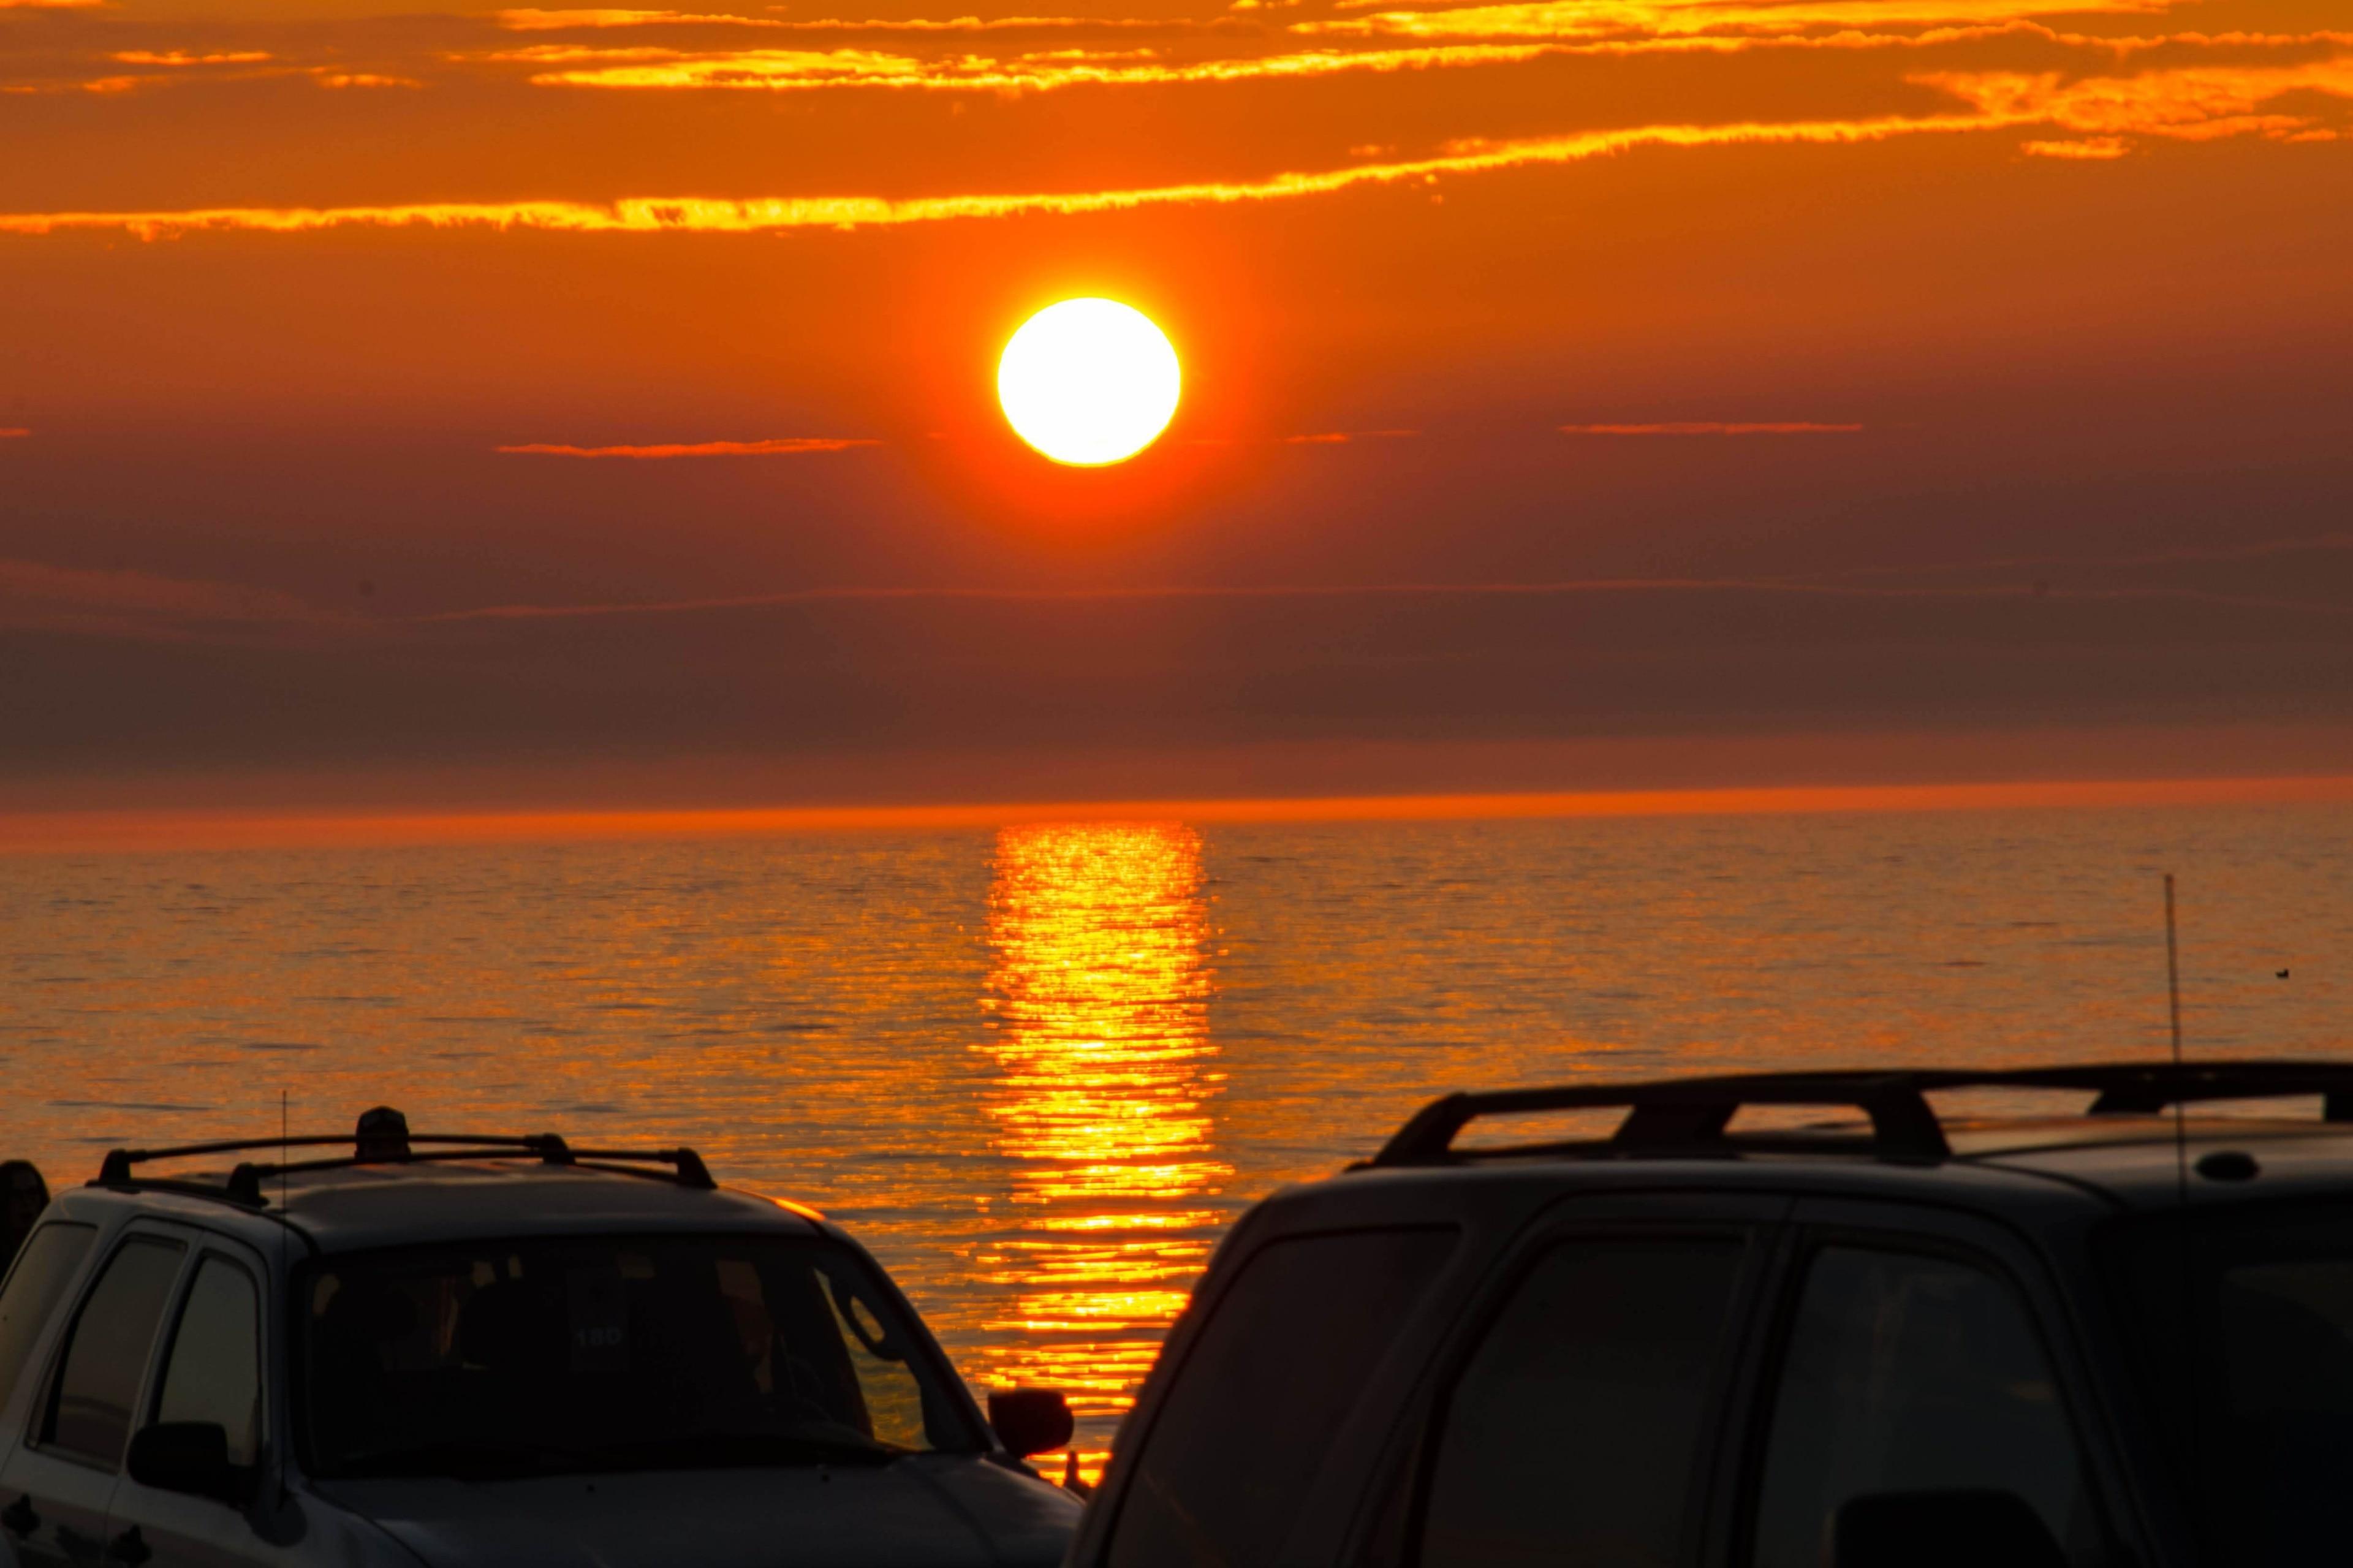 Sauble Beach, South Bruce Peninsula, Ontario, Canada